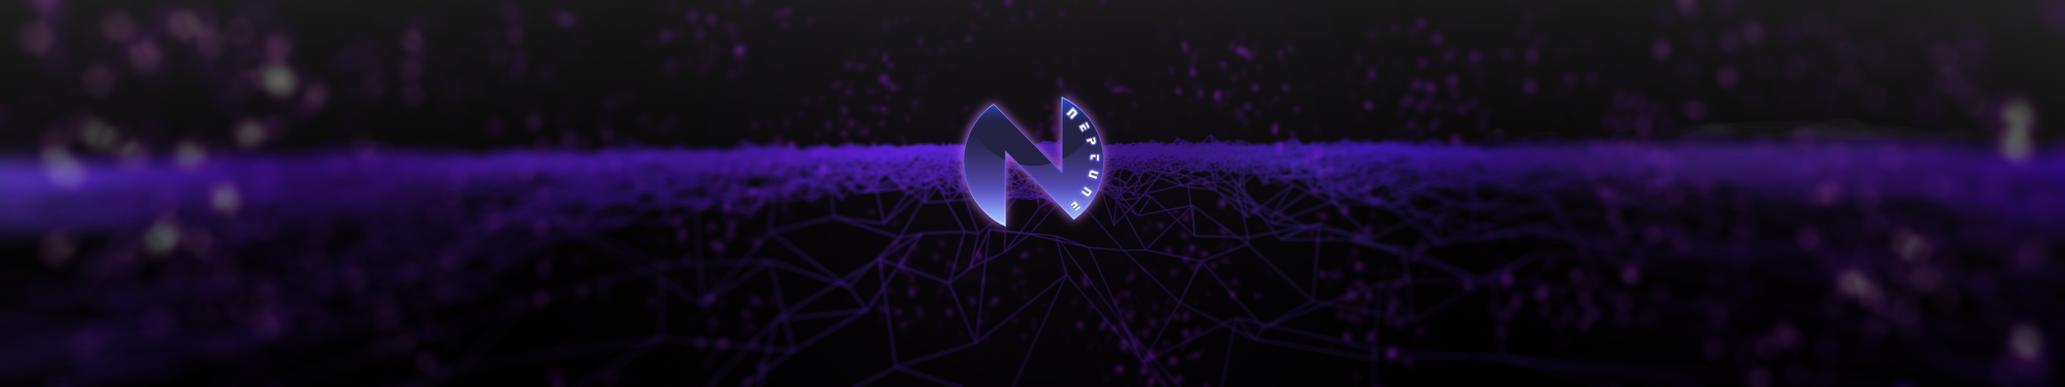 Hyperdimension Neptunia Wallpaper by halomademeapc